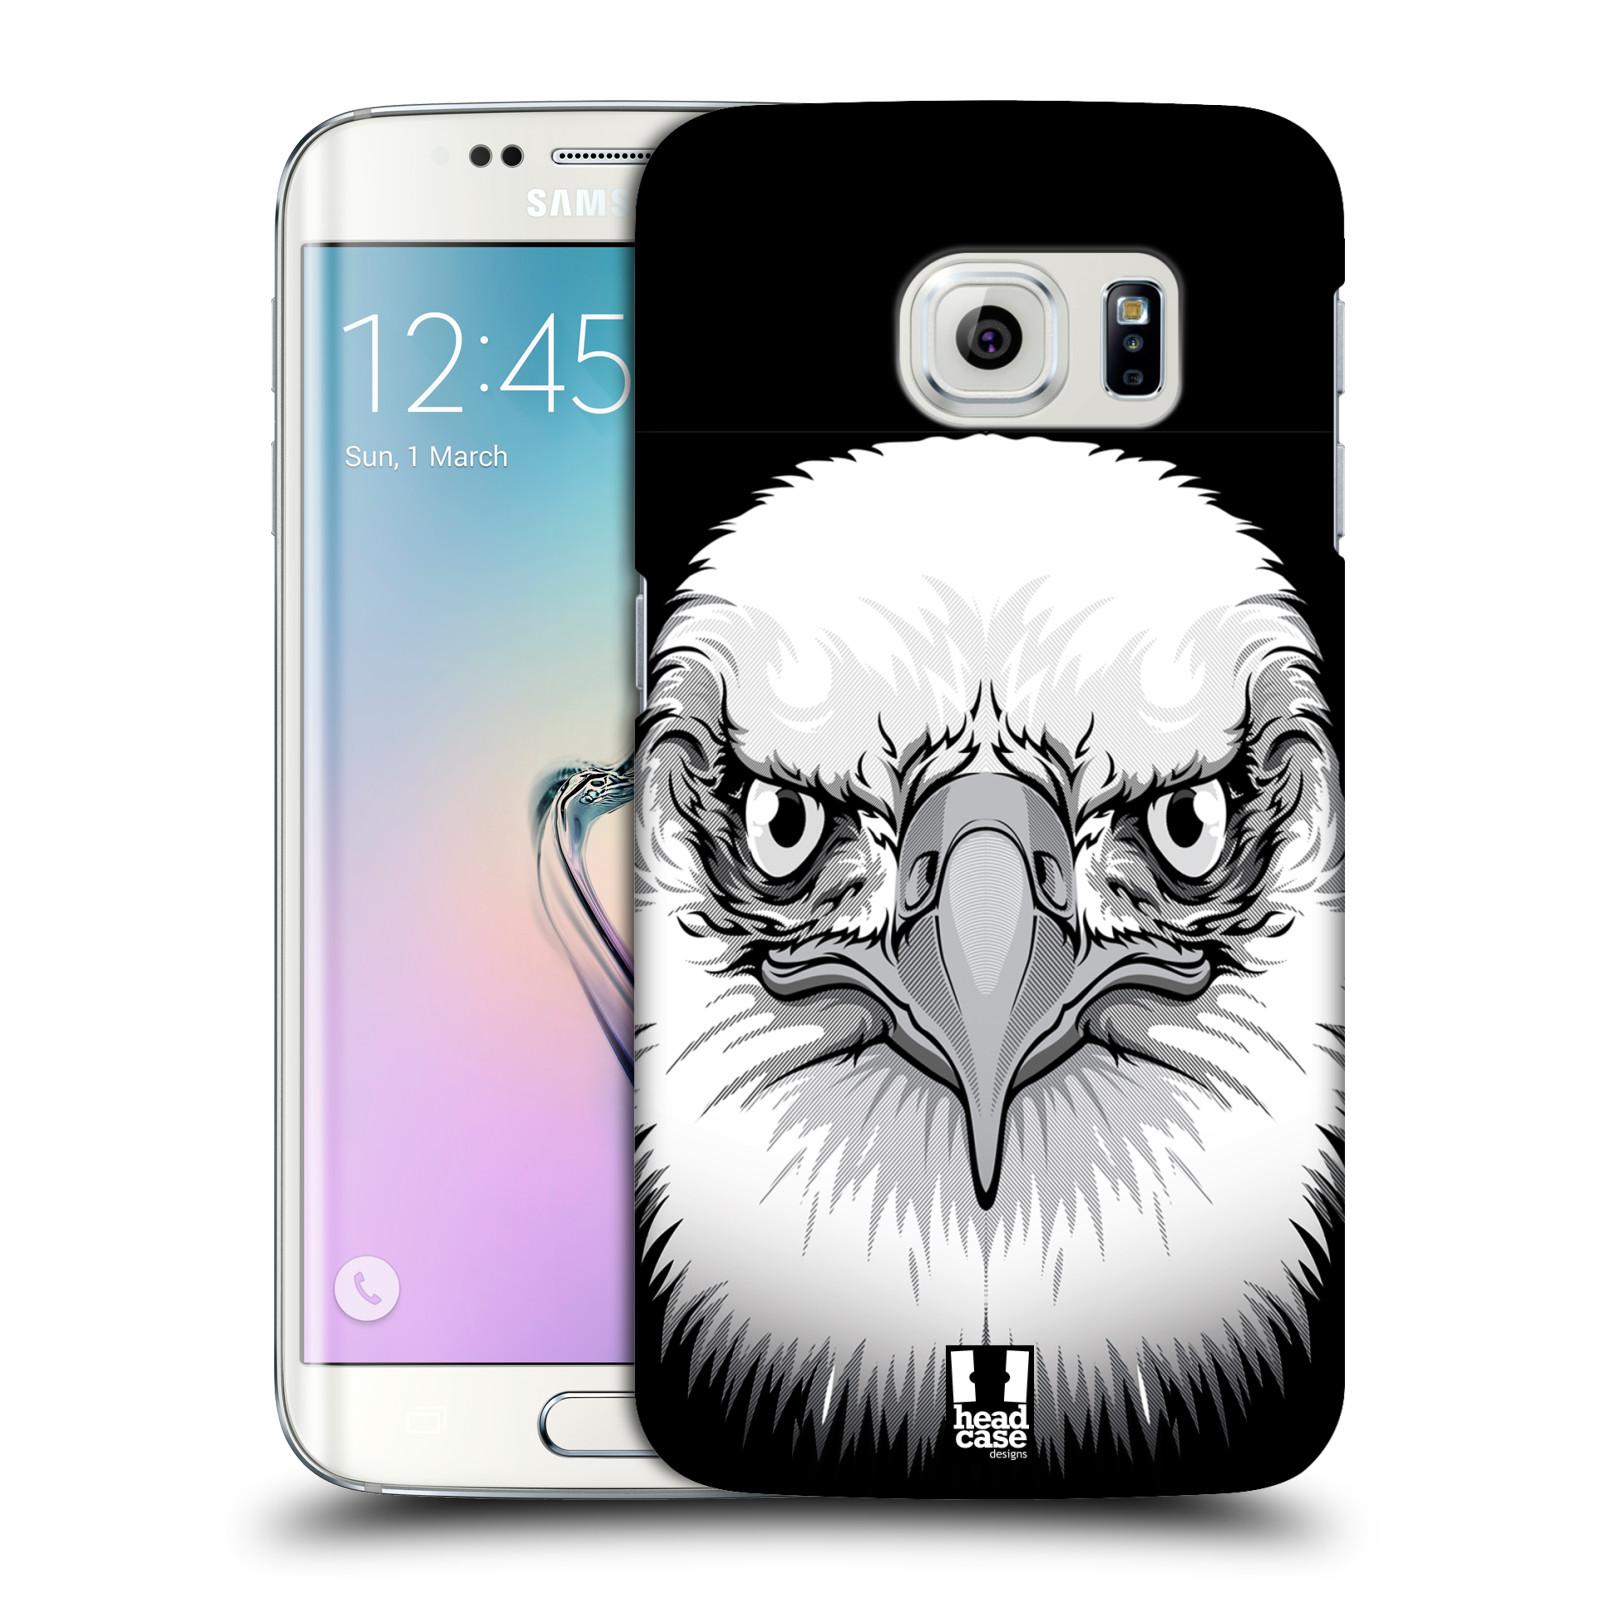 HEAD CASE plastový obal na mobil SAMSUNG Galaxy S6 EDGE (G9250, G925, G925F) vzor Zvíře kreslená tvář orel